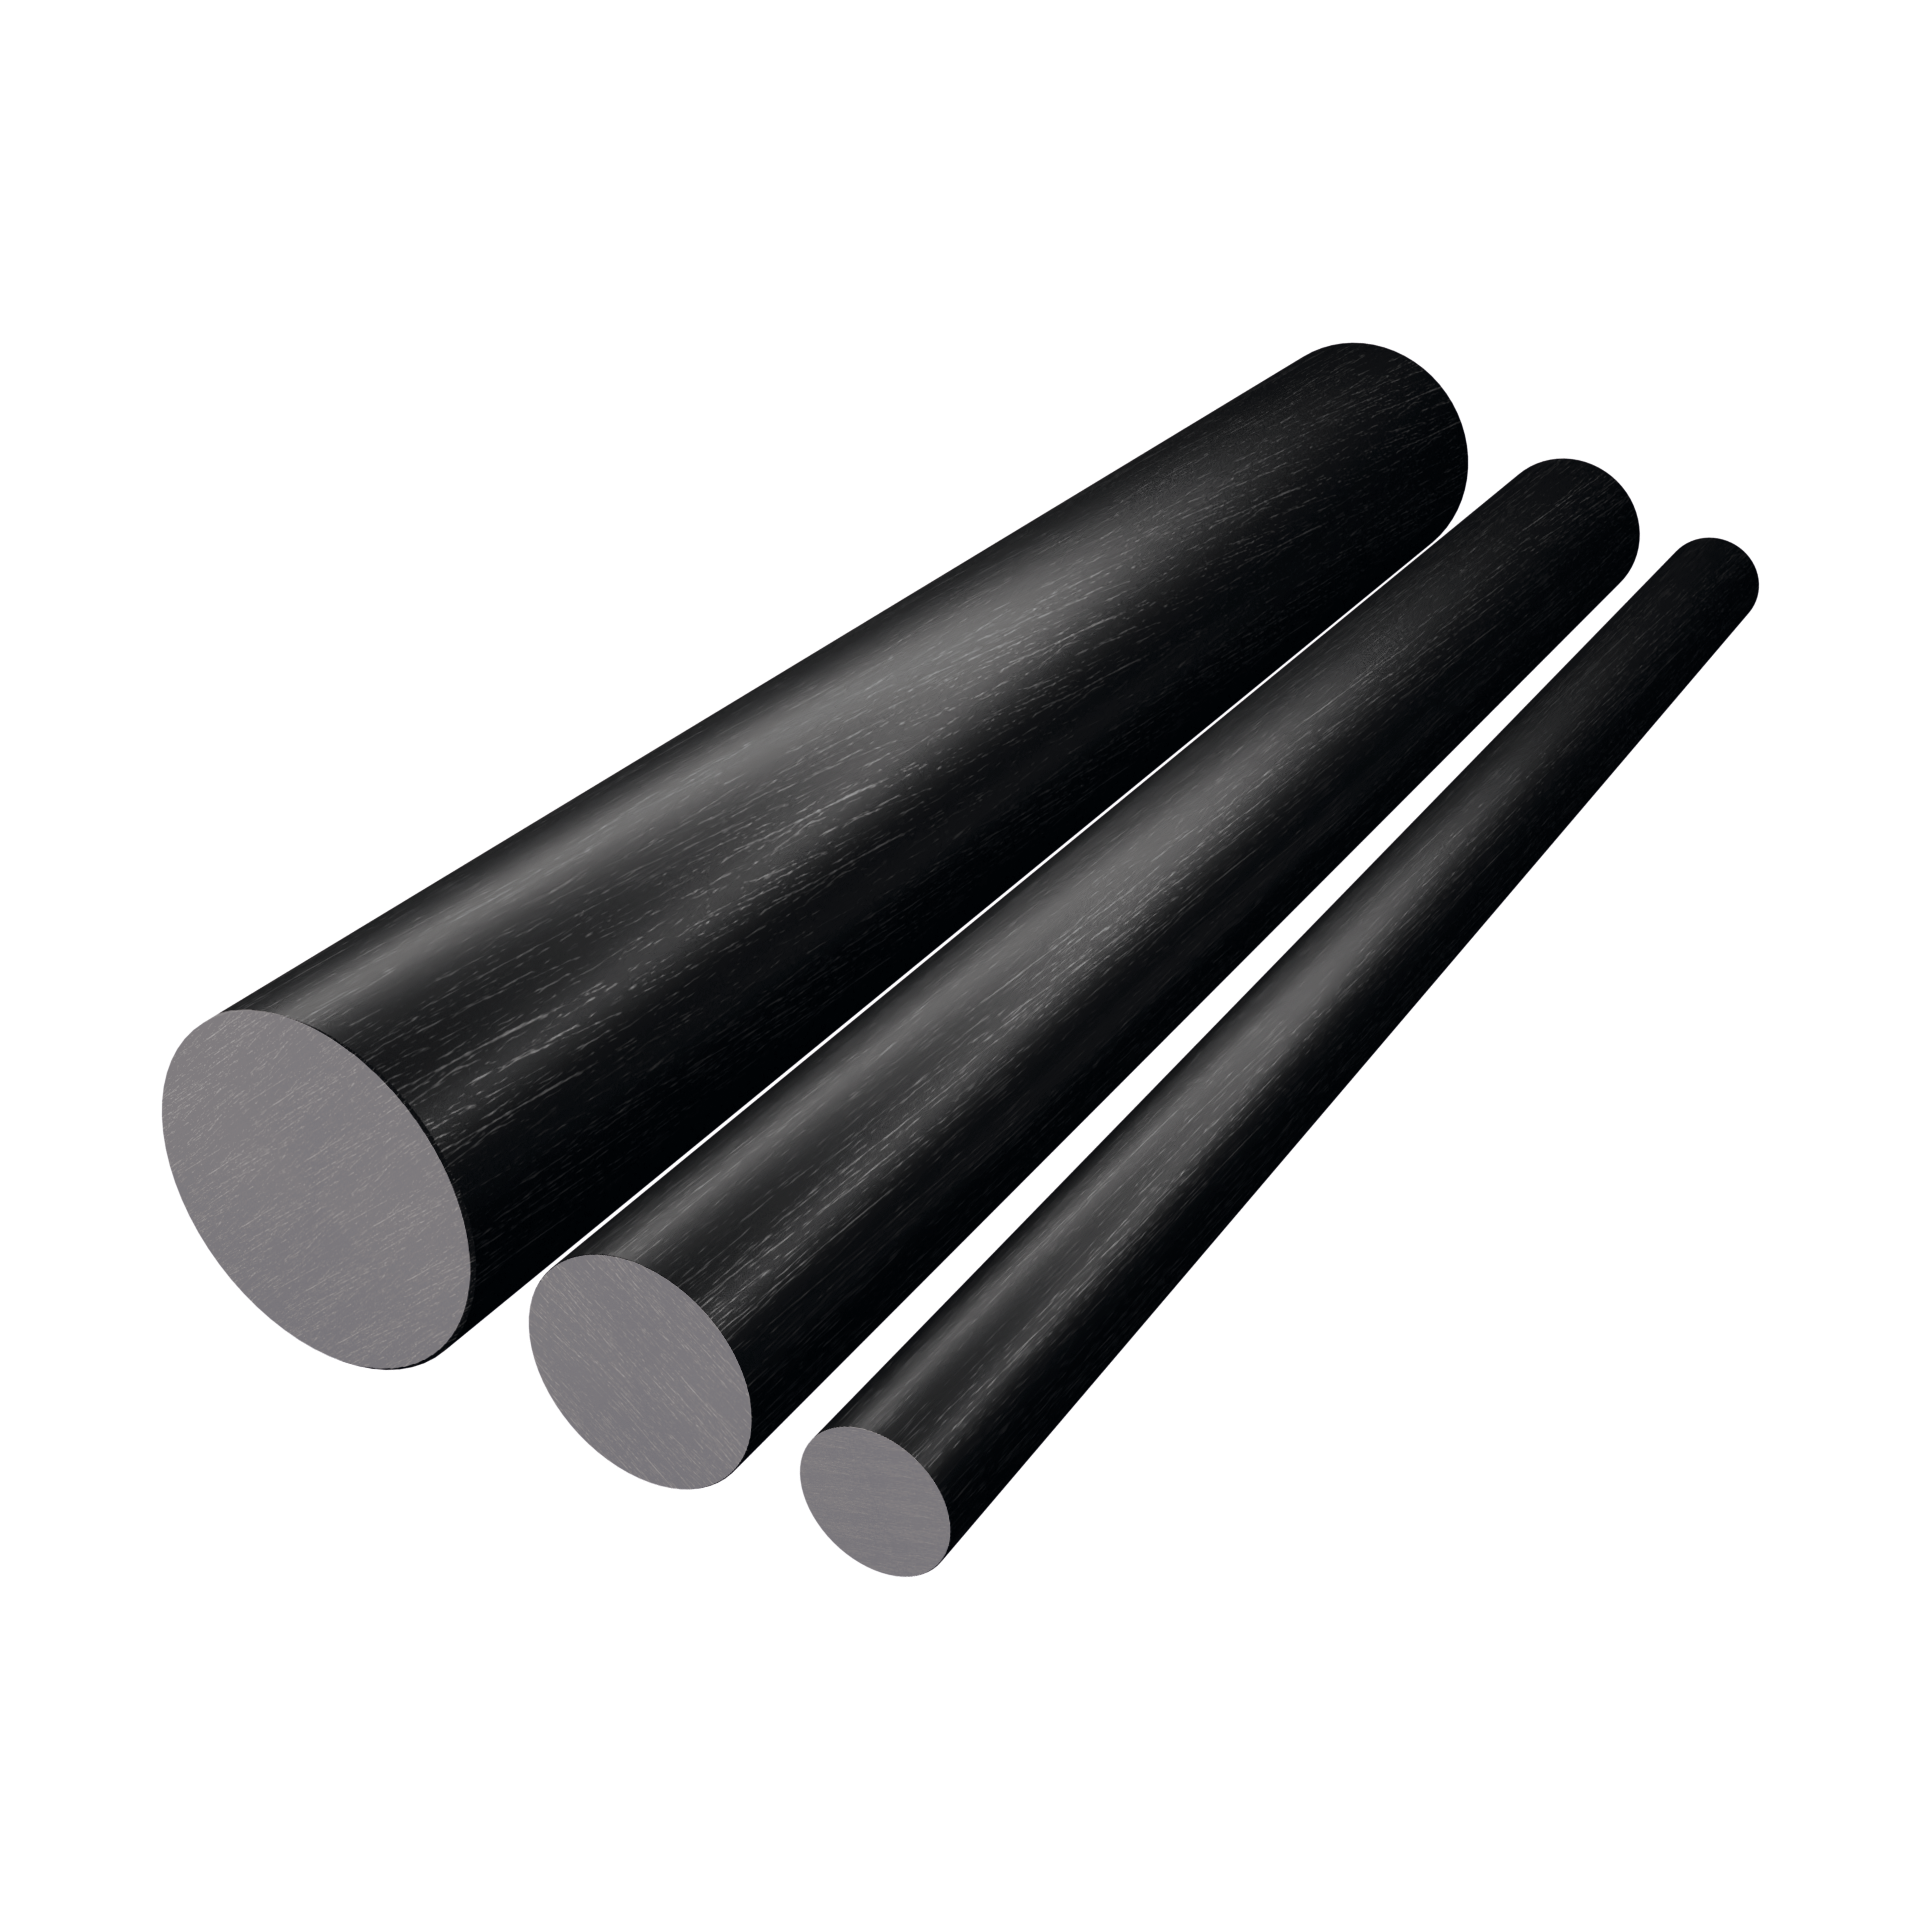 CarboSix carbon fibre Round bars